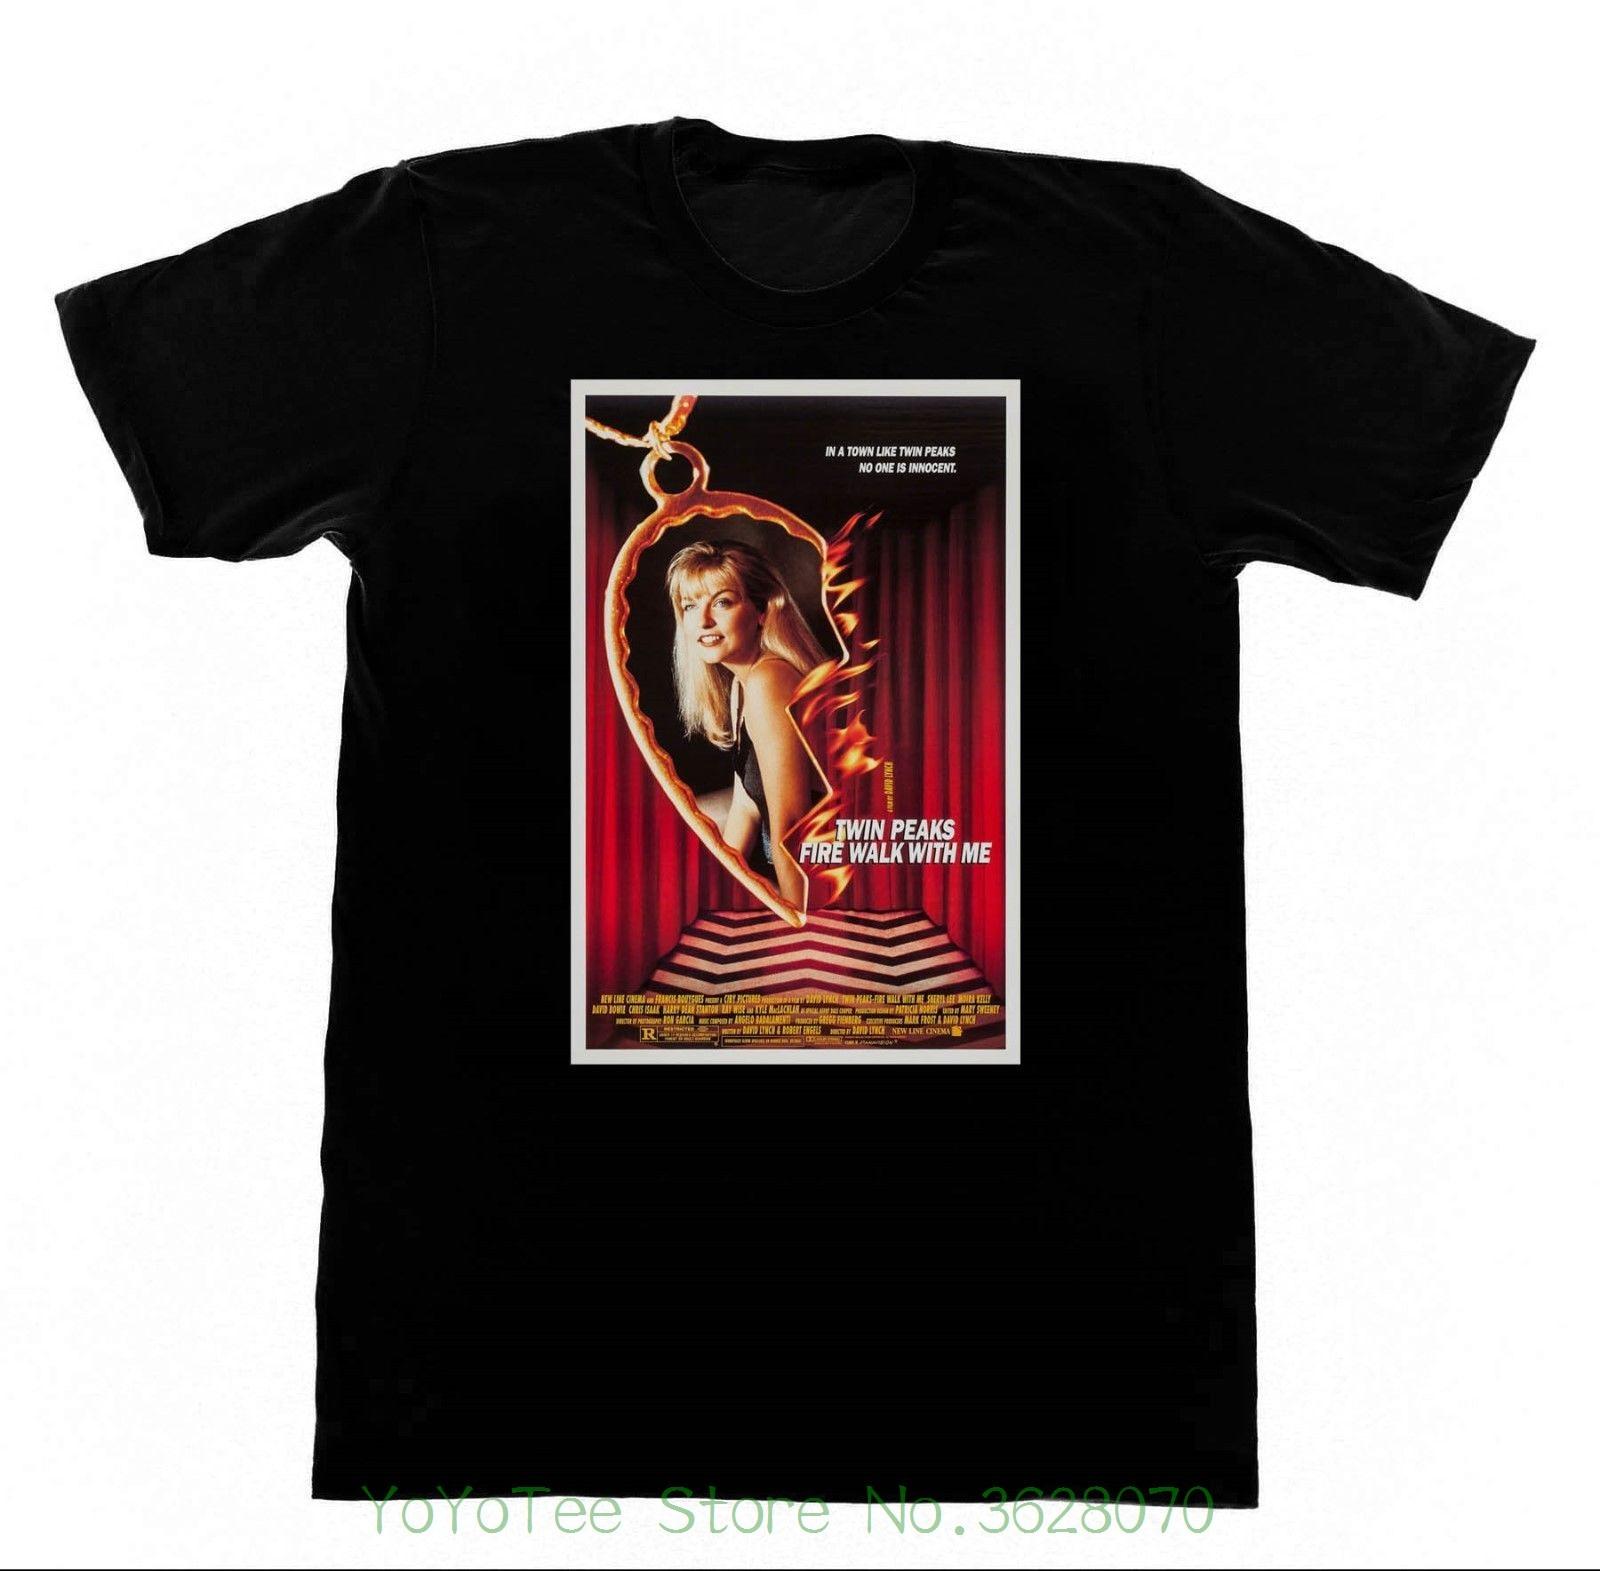 Man Fashion Round Collar T Shirt Twin Peaks Fire Walk With Me - Shirt 202 Tshirt David Lynch Eraserhead